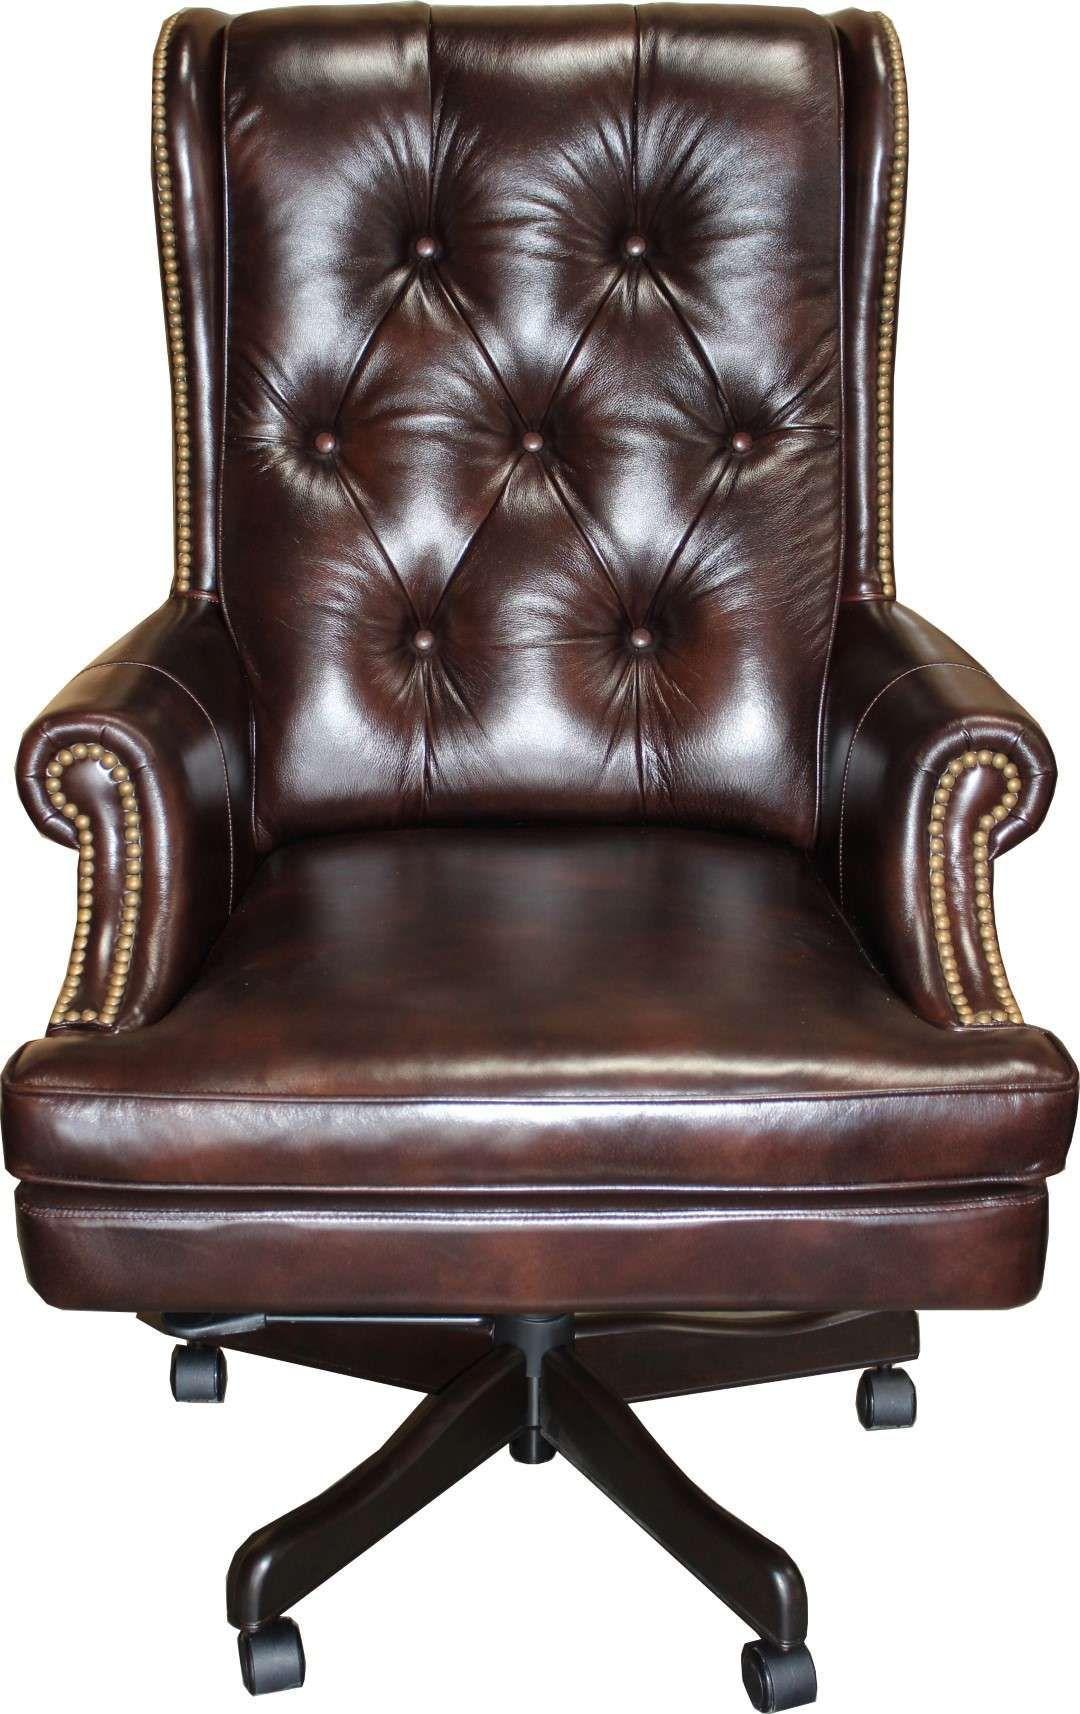 Lowest Price On Parker Living Prestige Havana Leather Desk Chair